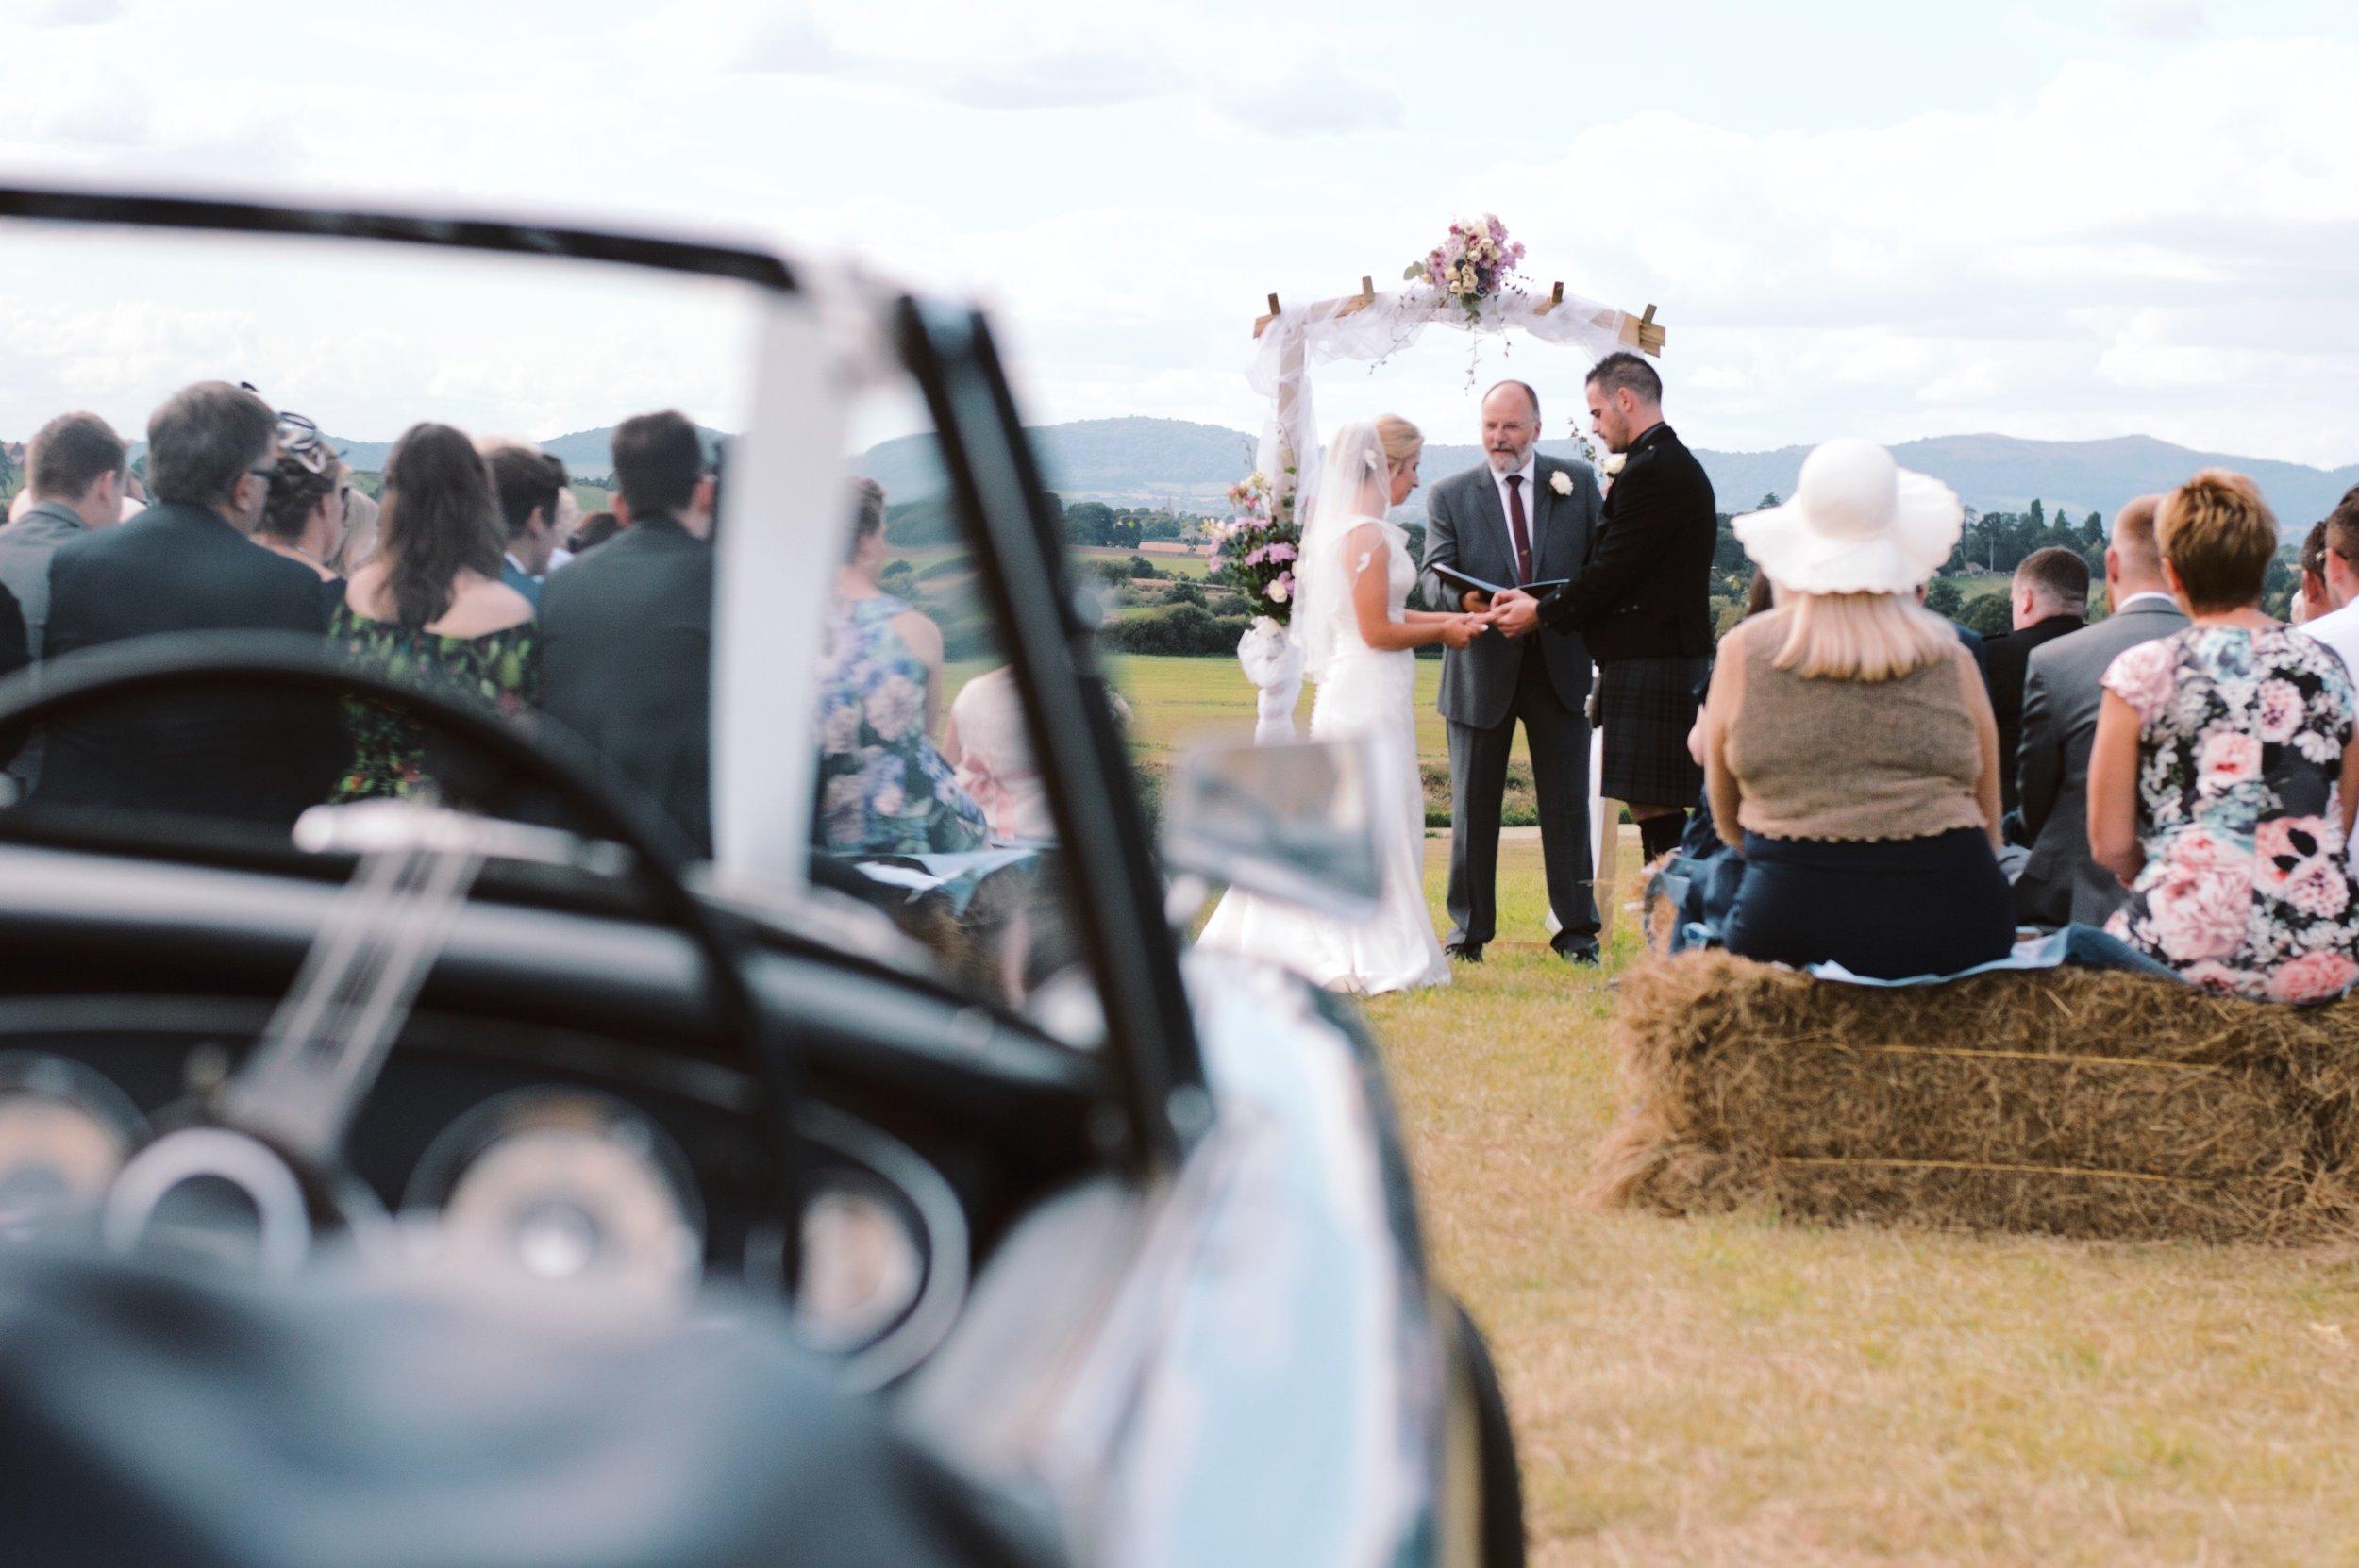 Maresca Wedding - Photos by Hannah Fathers  133.jpg